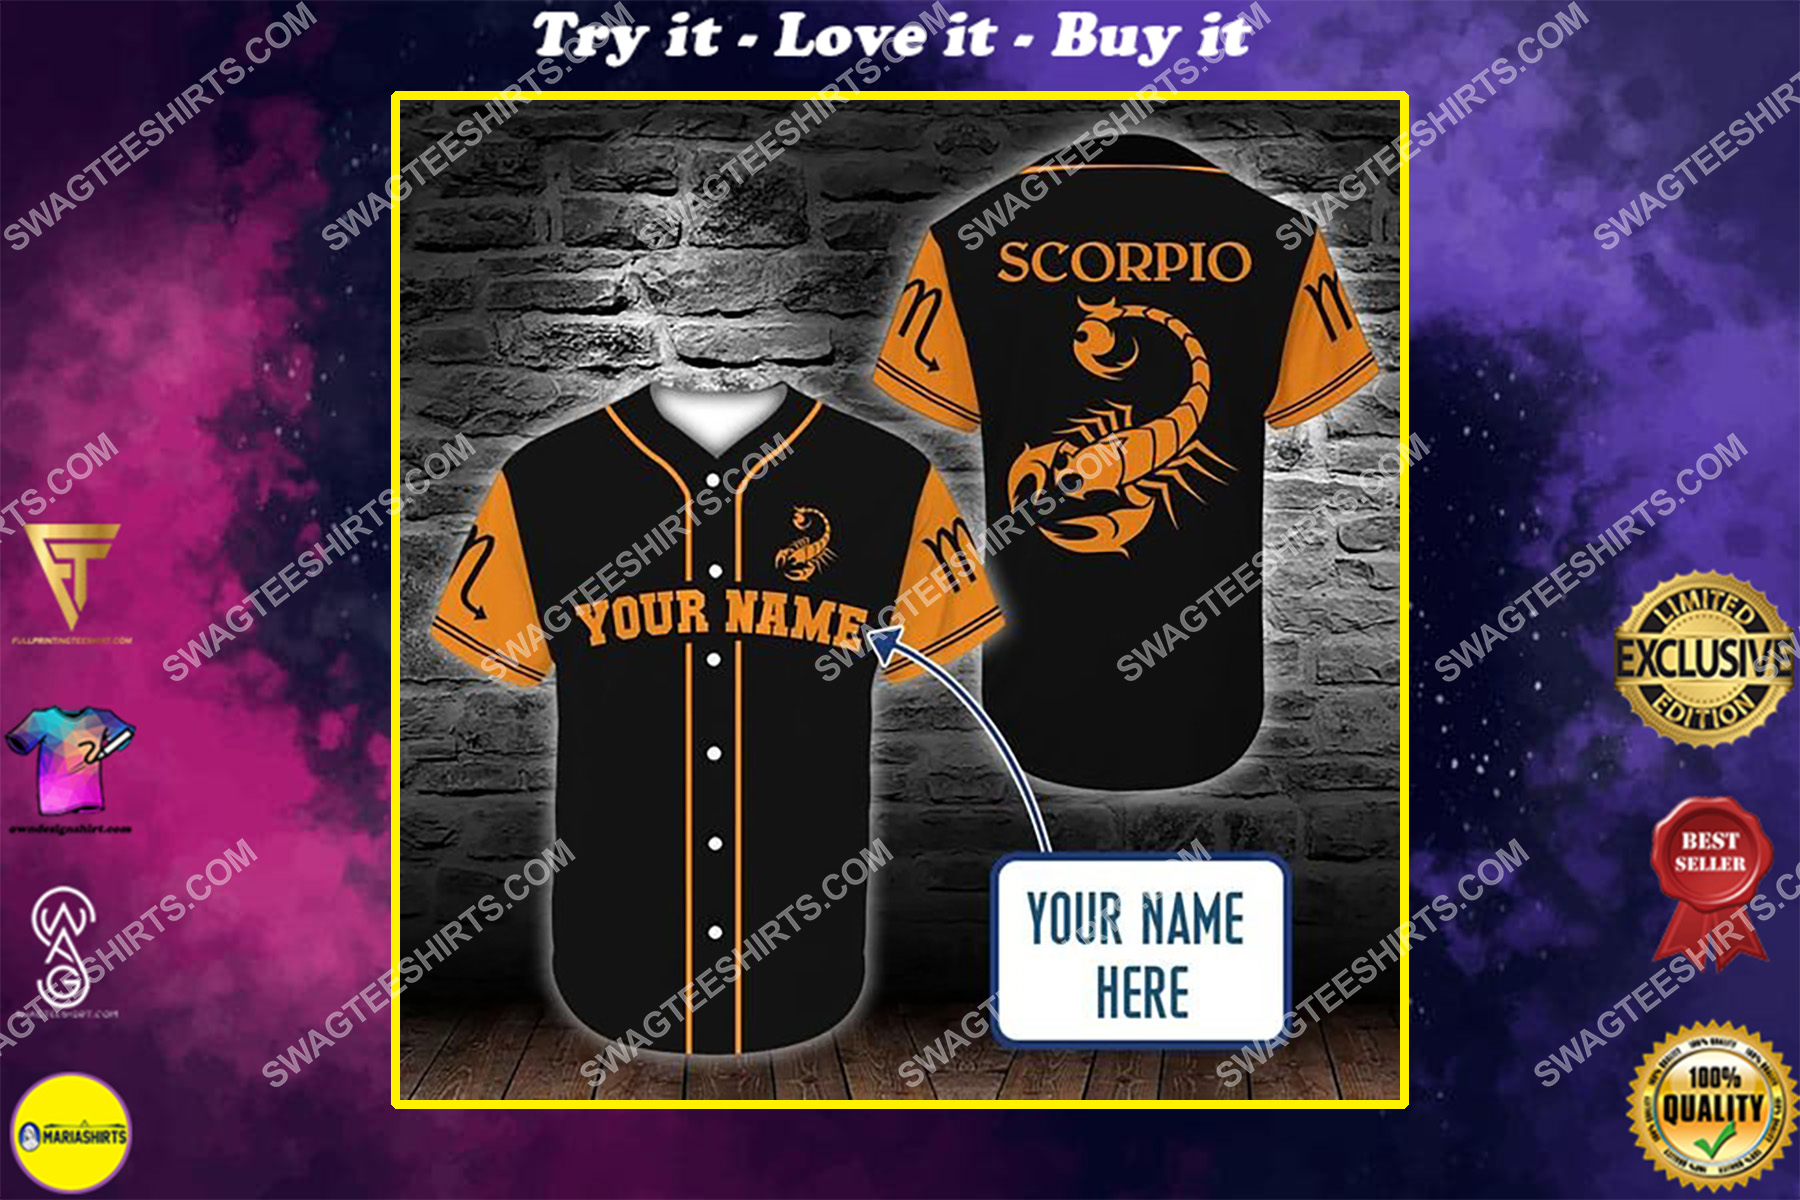 custom name scorpio zodiac birthday gift all over printed baseball shirt